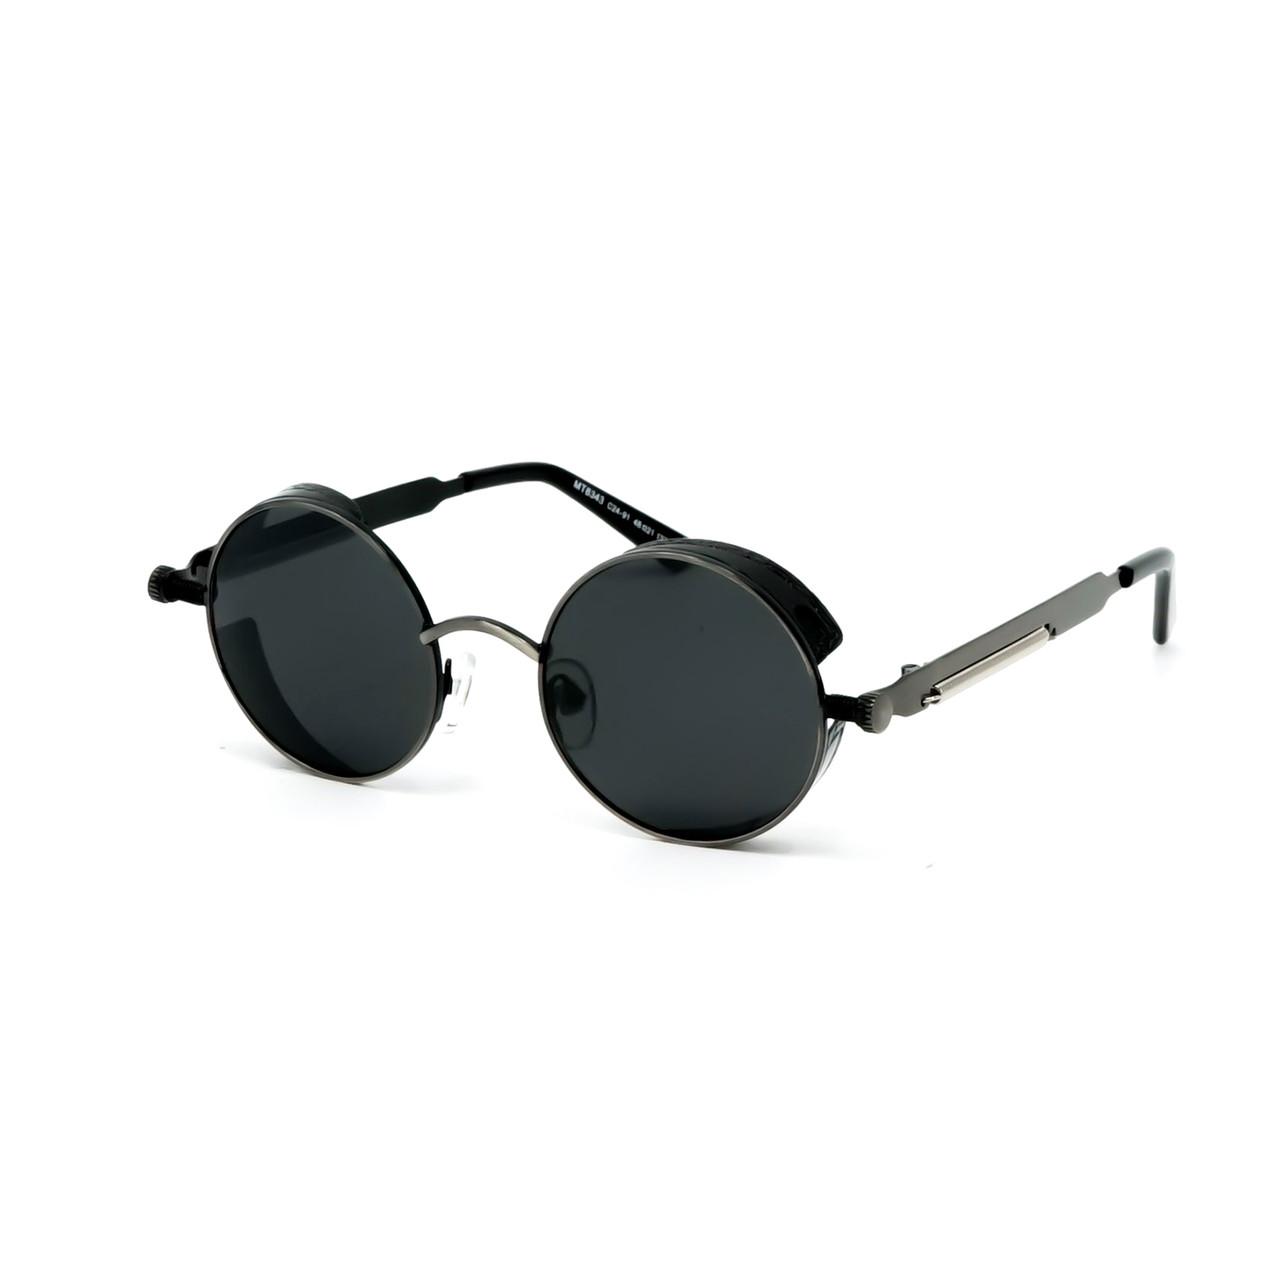 Солнцезащитные очки Matrix MT8343 C24-91      ( MT8343-C24-91 )